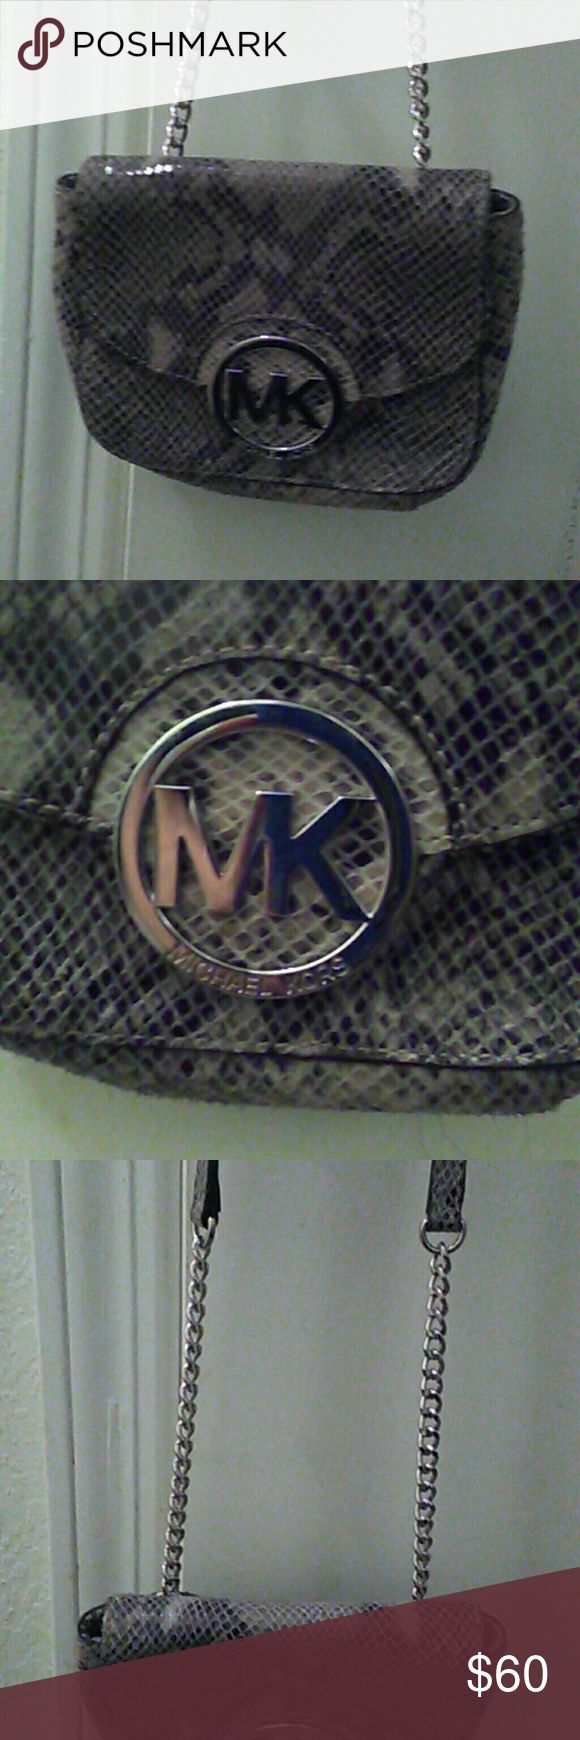 WEEKEND DEAL! MICHAEL KORS CROSSBODY Snakeskin crossbow handbag MICHAEL KORS  Bags Crossbody Bags